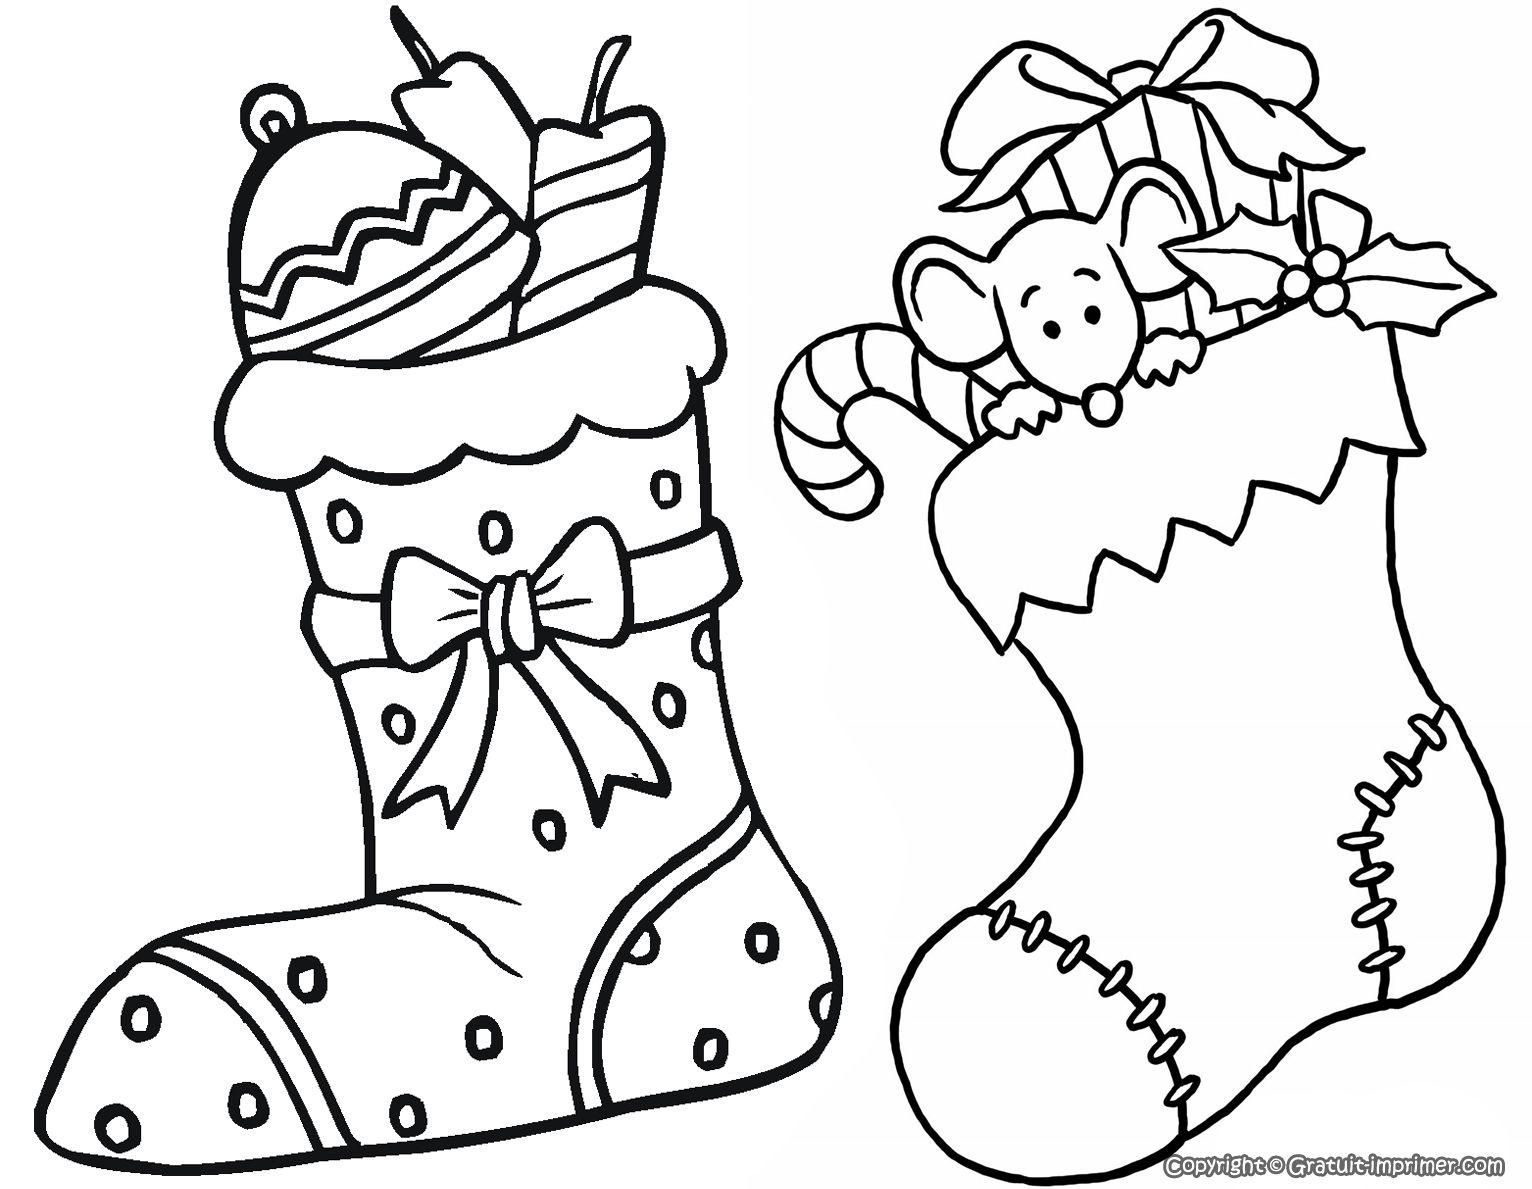 Coloriage | Dessin Noel A Imprimer, Coloriage Noel, Dessin serapportantà Dessin De Noel A Imprimer Gratuit